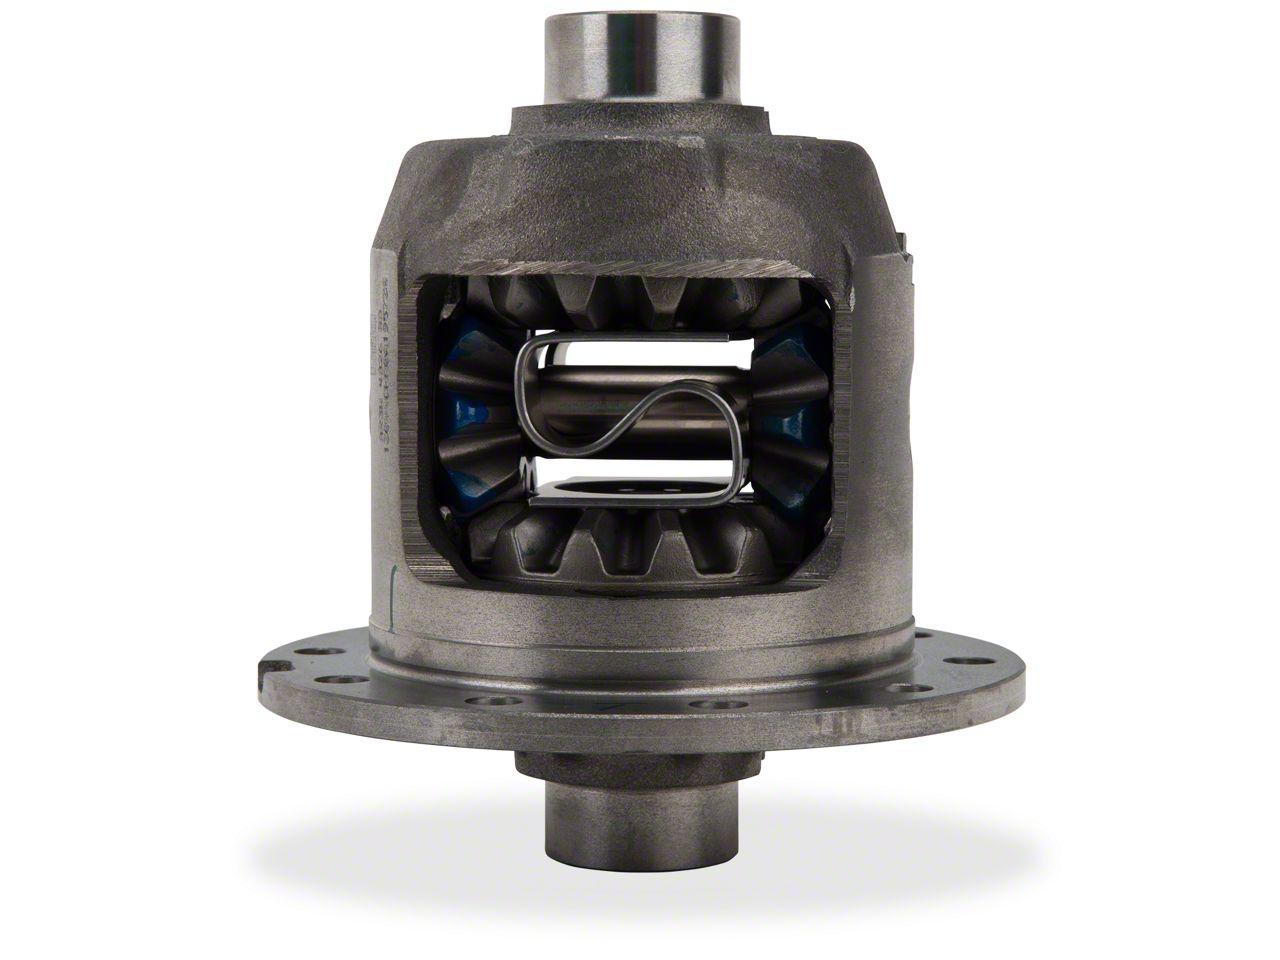 Ford Performance Traction-LOK Limited Slip Differential w/ Carbon Discs - 31 Spline 8.8 in. (11-14 V6; 86-14 V8, Excluding 13-14 GT500)